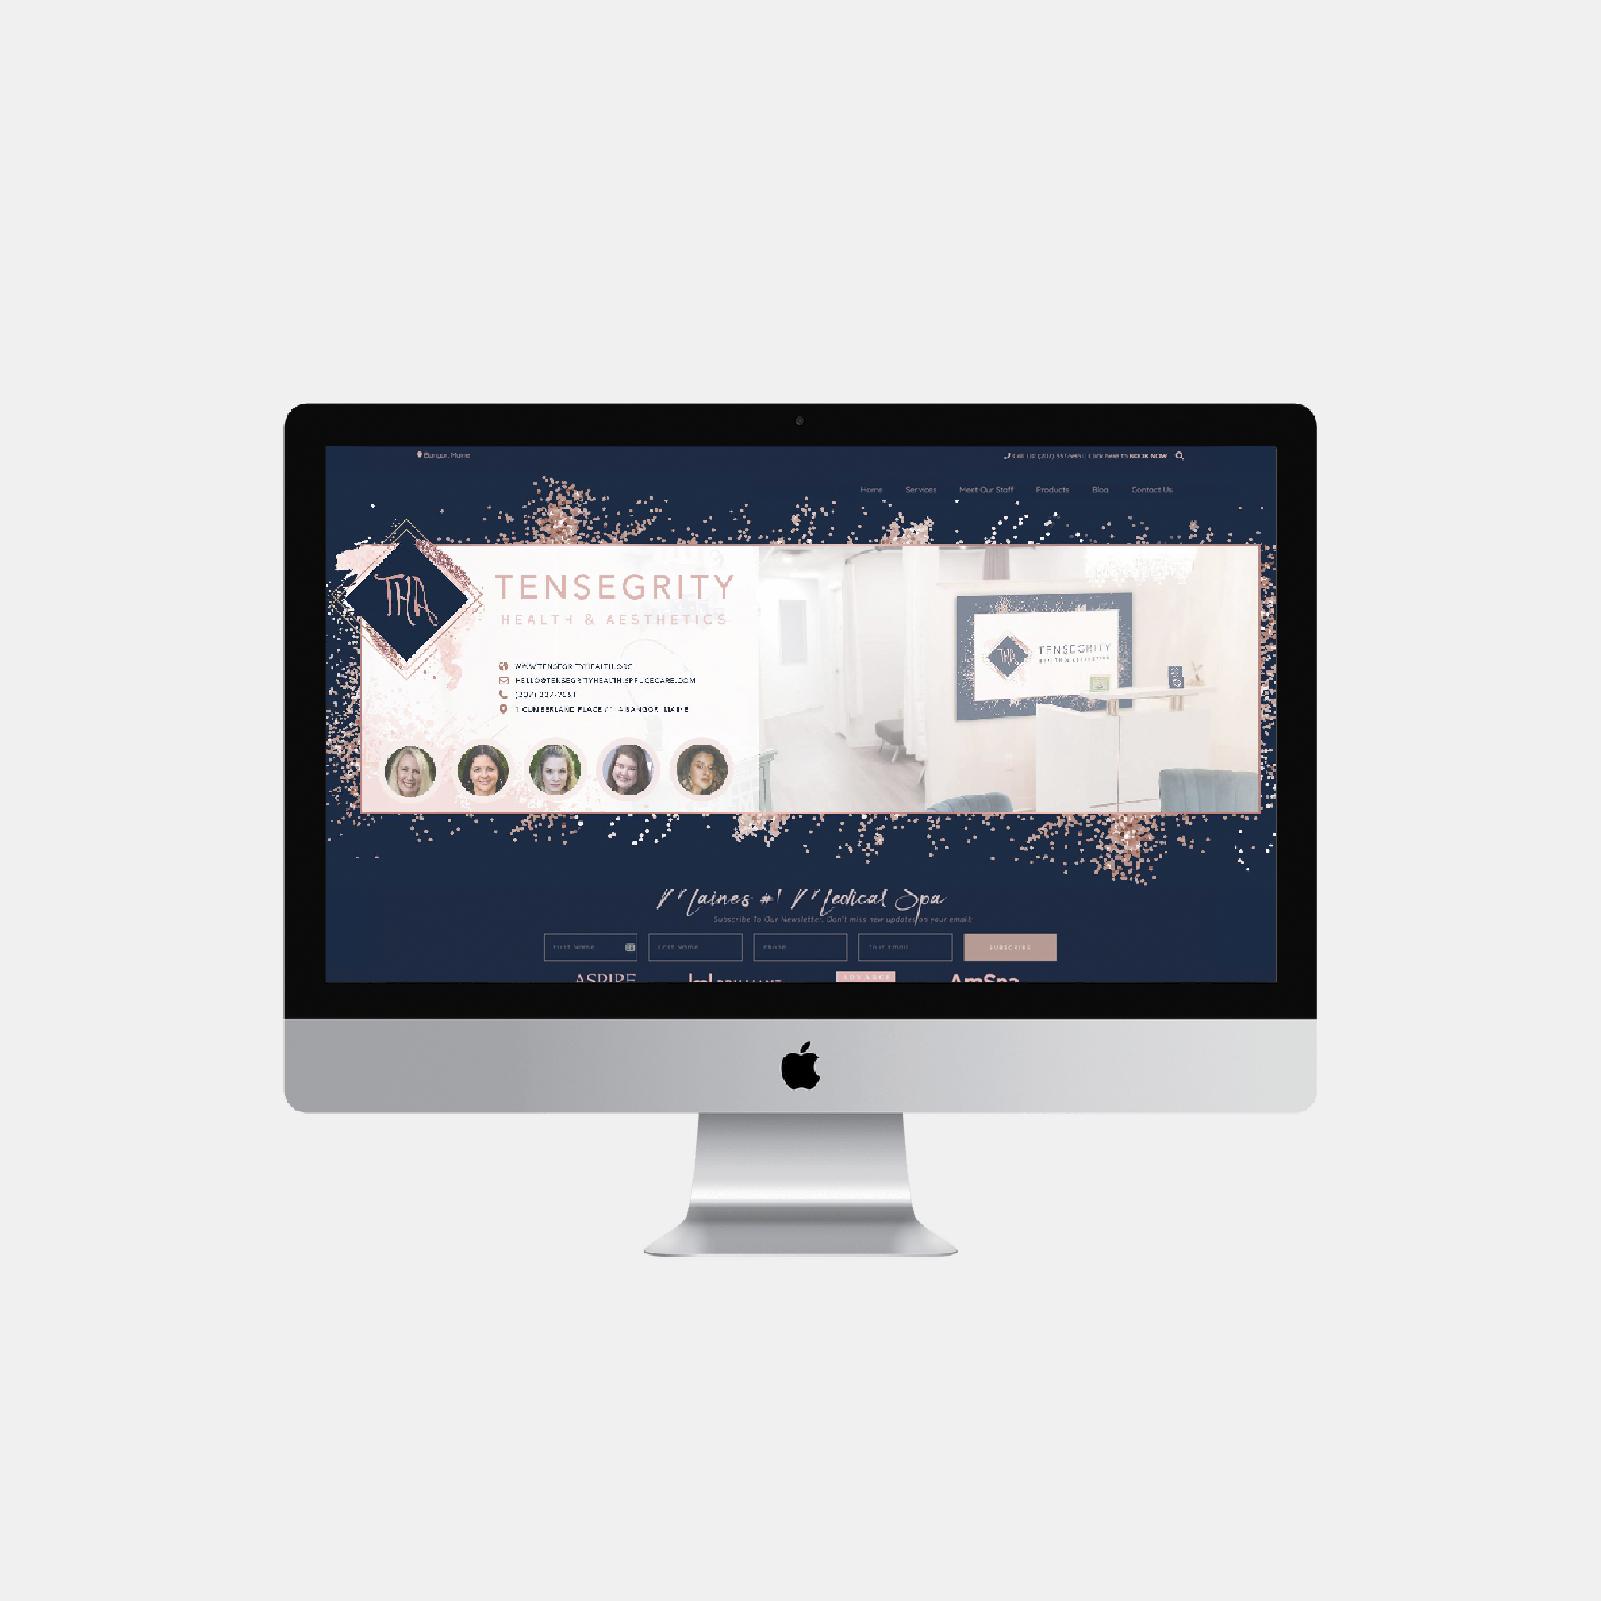 Tensegrity Health & Aesthetics   Web Design and Development By Andrea Studios